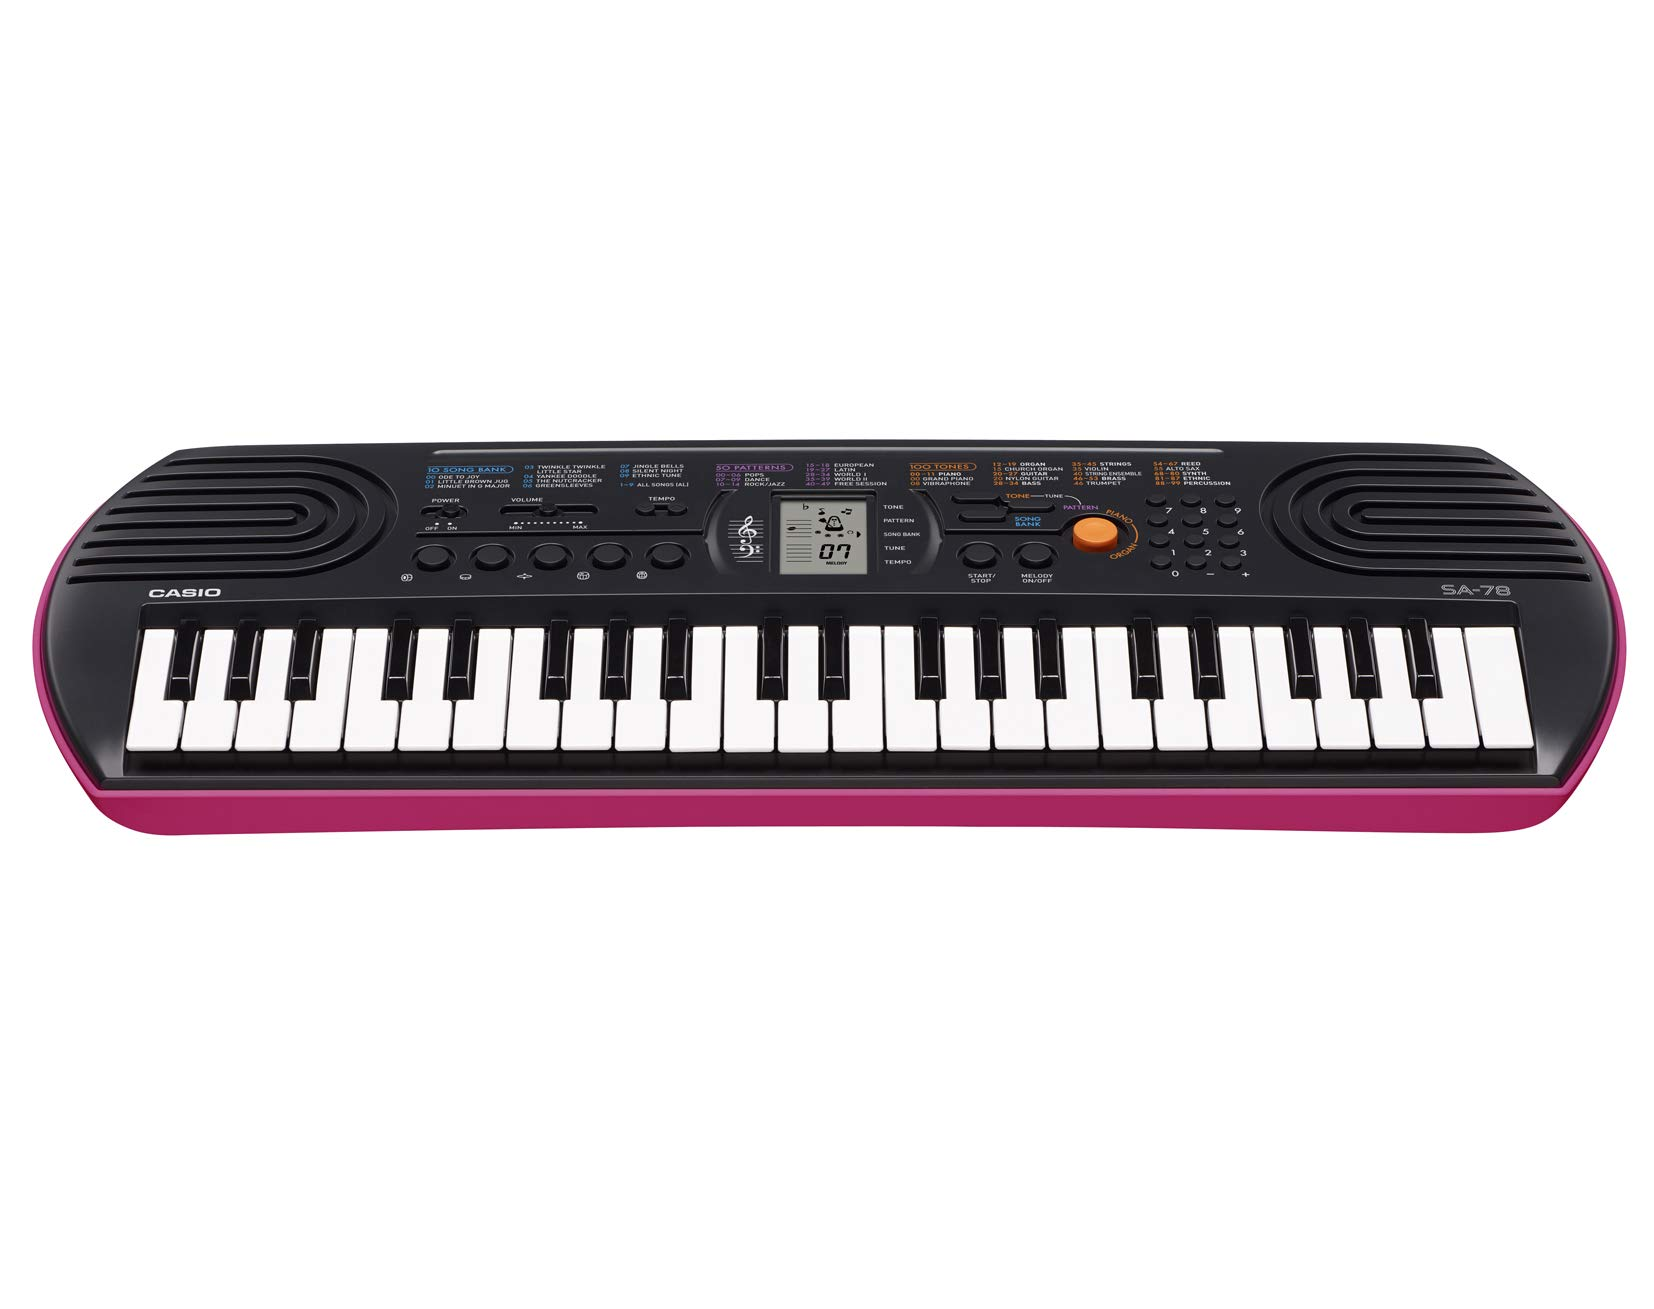 Casio SA-78 44-Key Mini Personal Keyboard by Casio (Image #2)